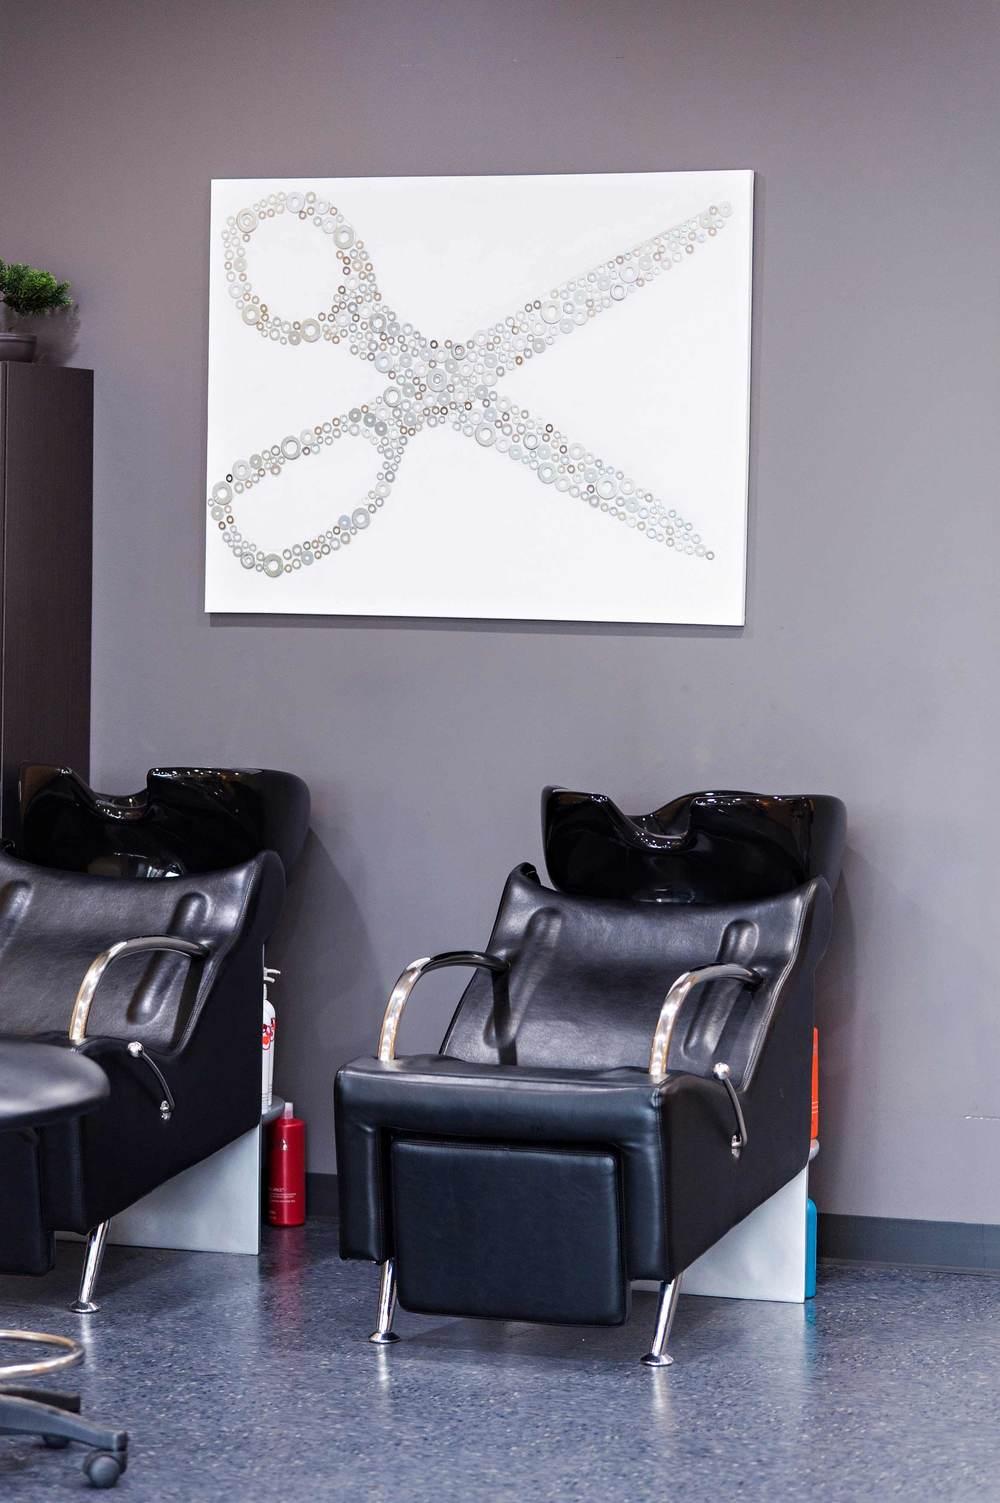 hair-washing-station-scissor-art.jpg